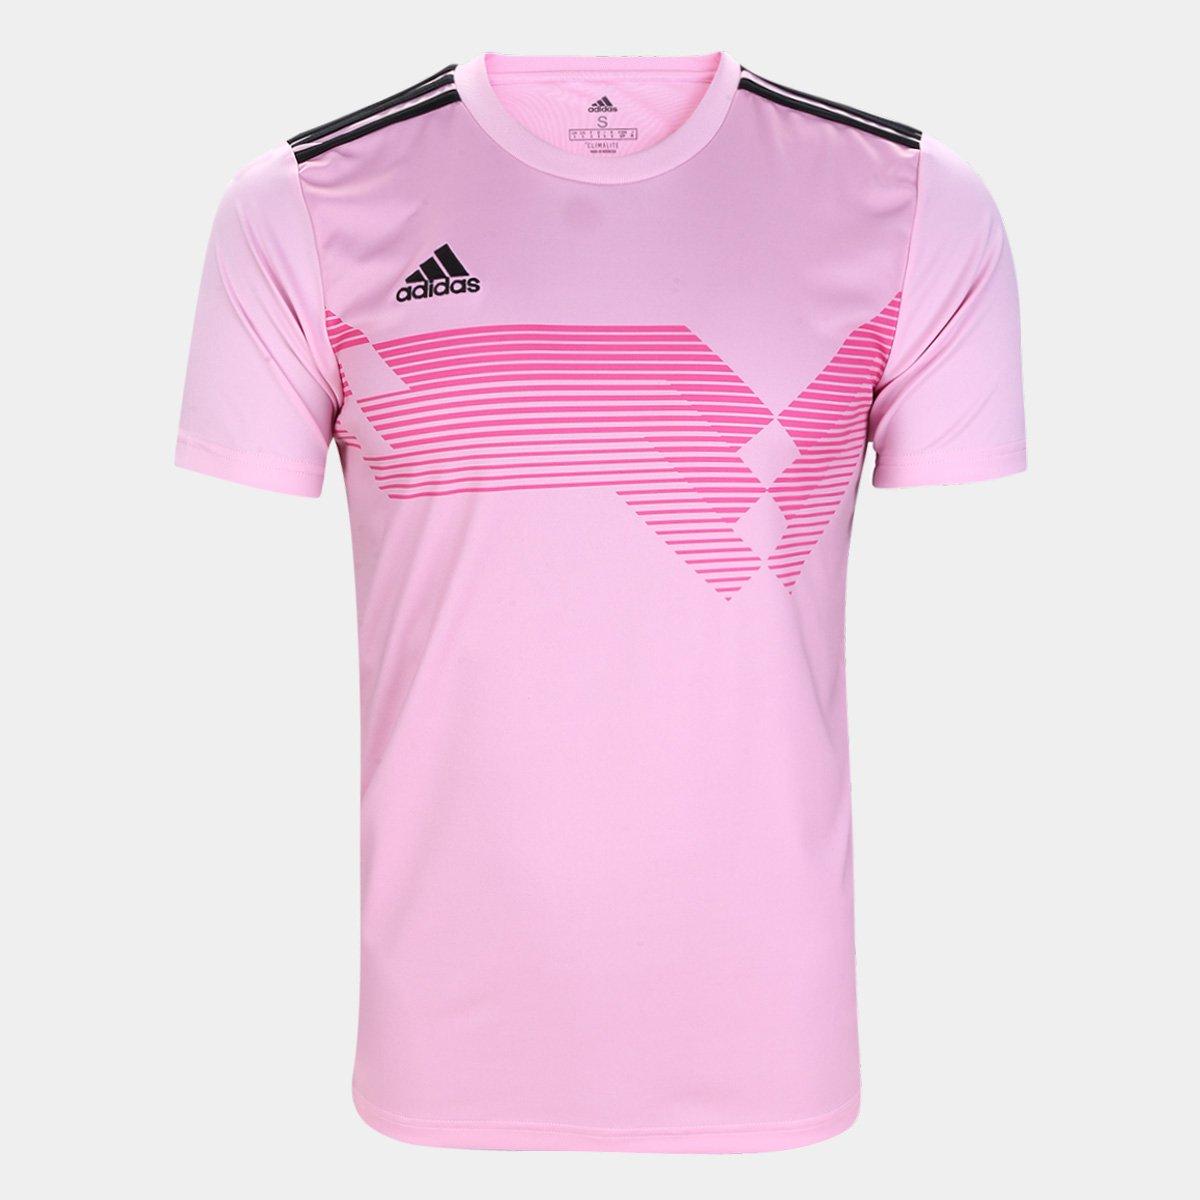 gloria escarcha Espectador  Camisa Adidas Campeon 19 Masculina - Pink   Netshoes